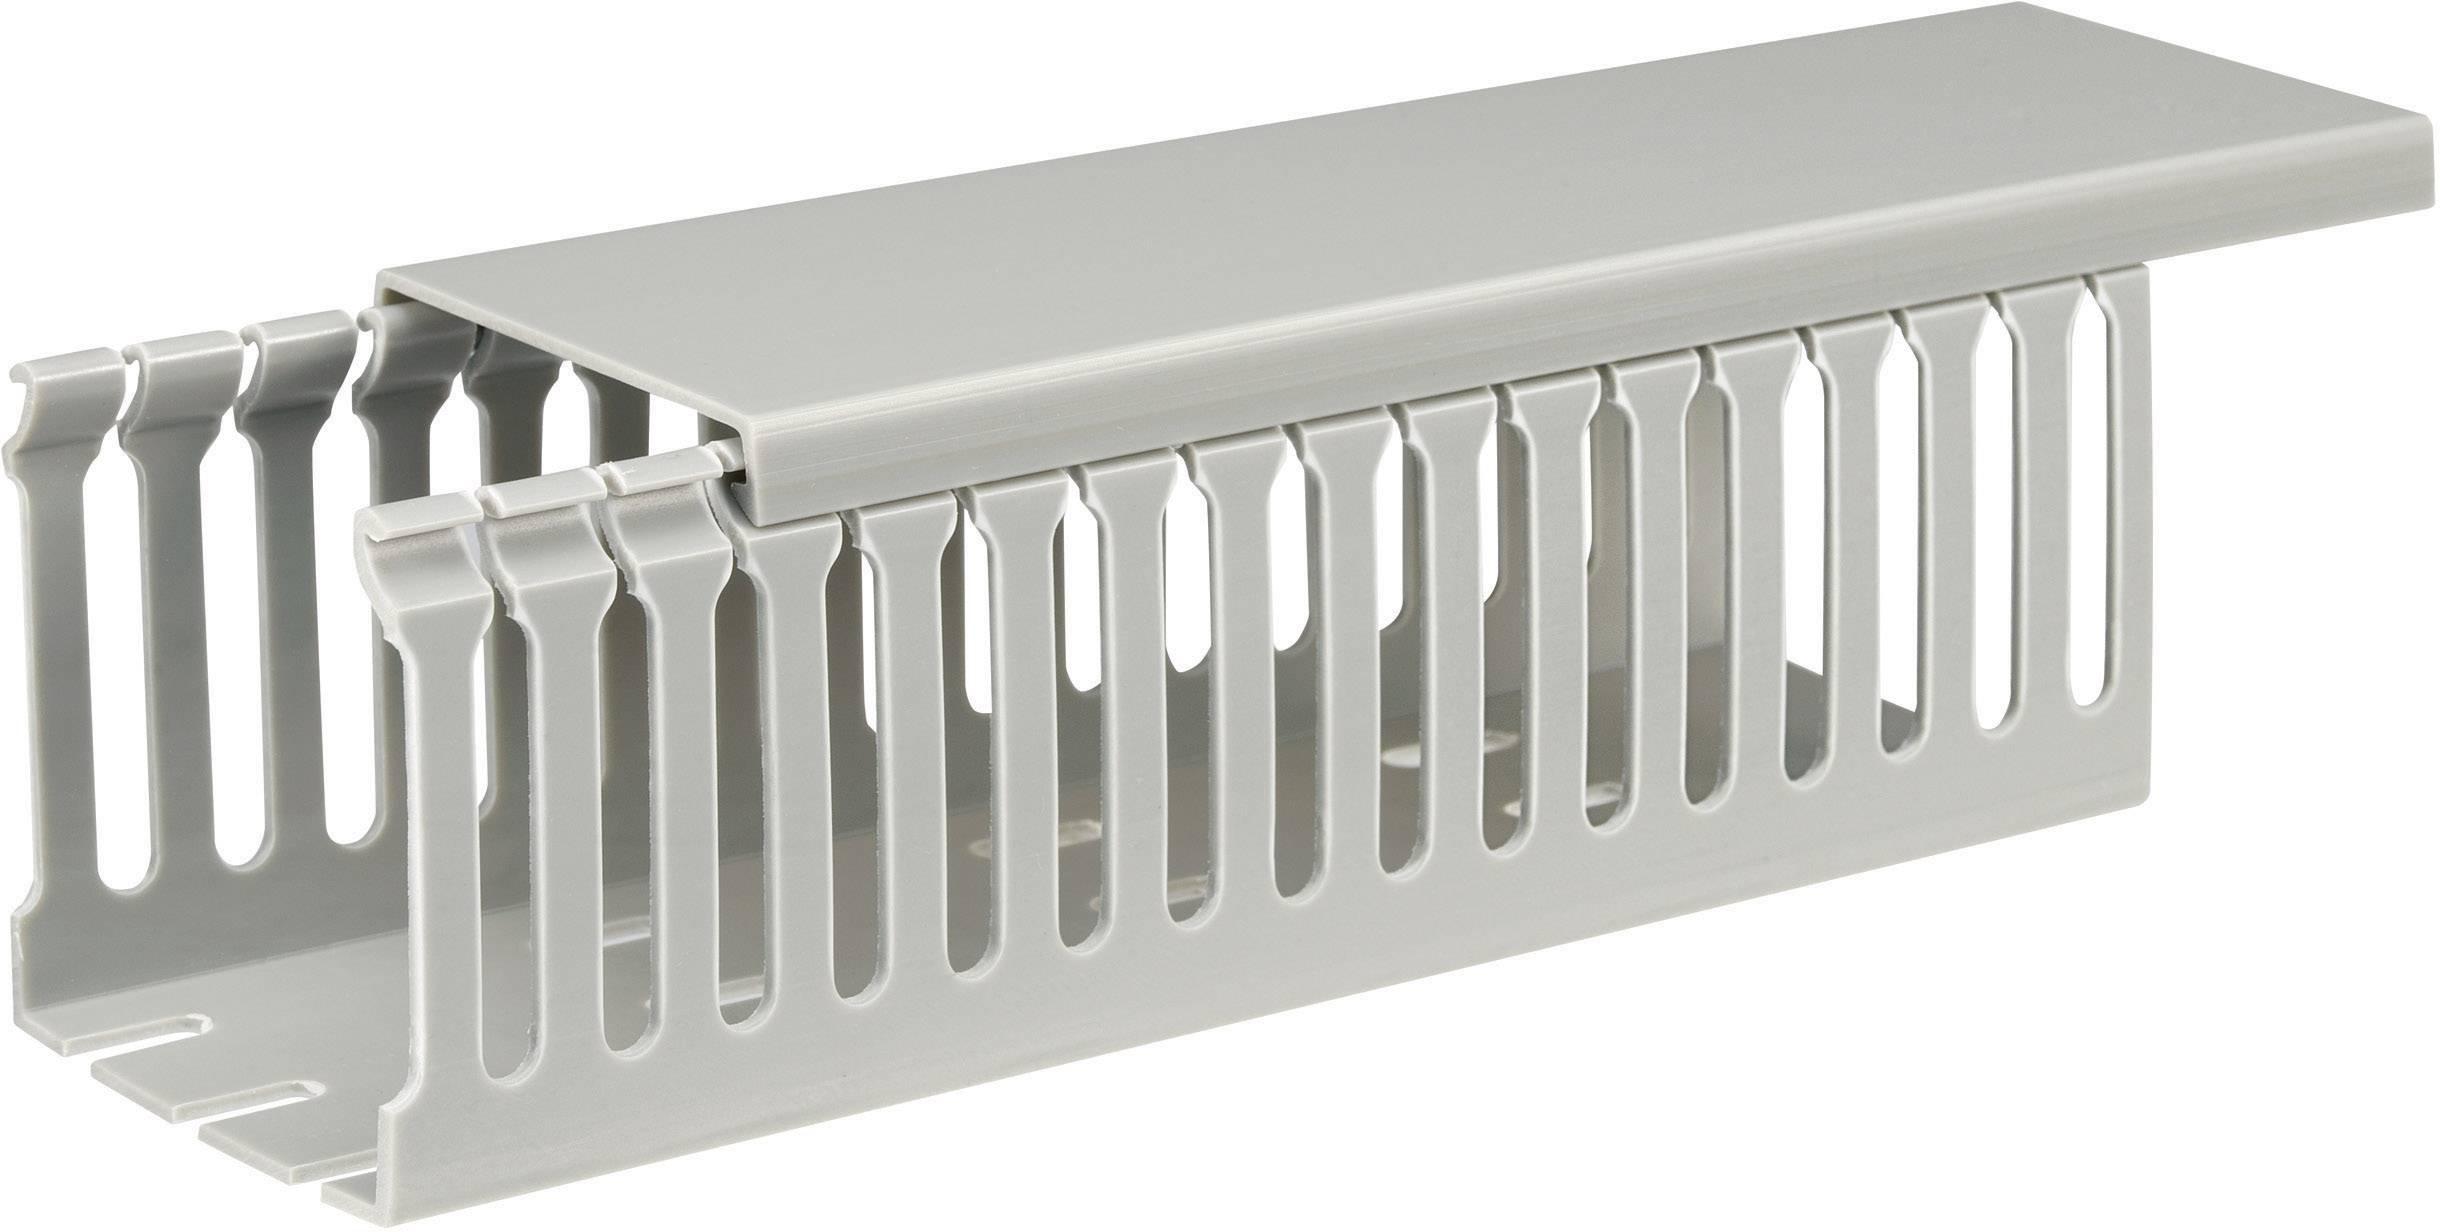 Elektroinstalační lišta, 65x65 mm, 2 m, šedá